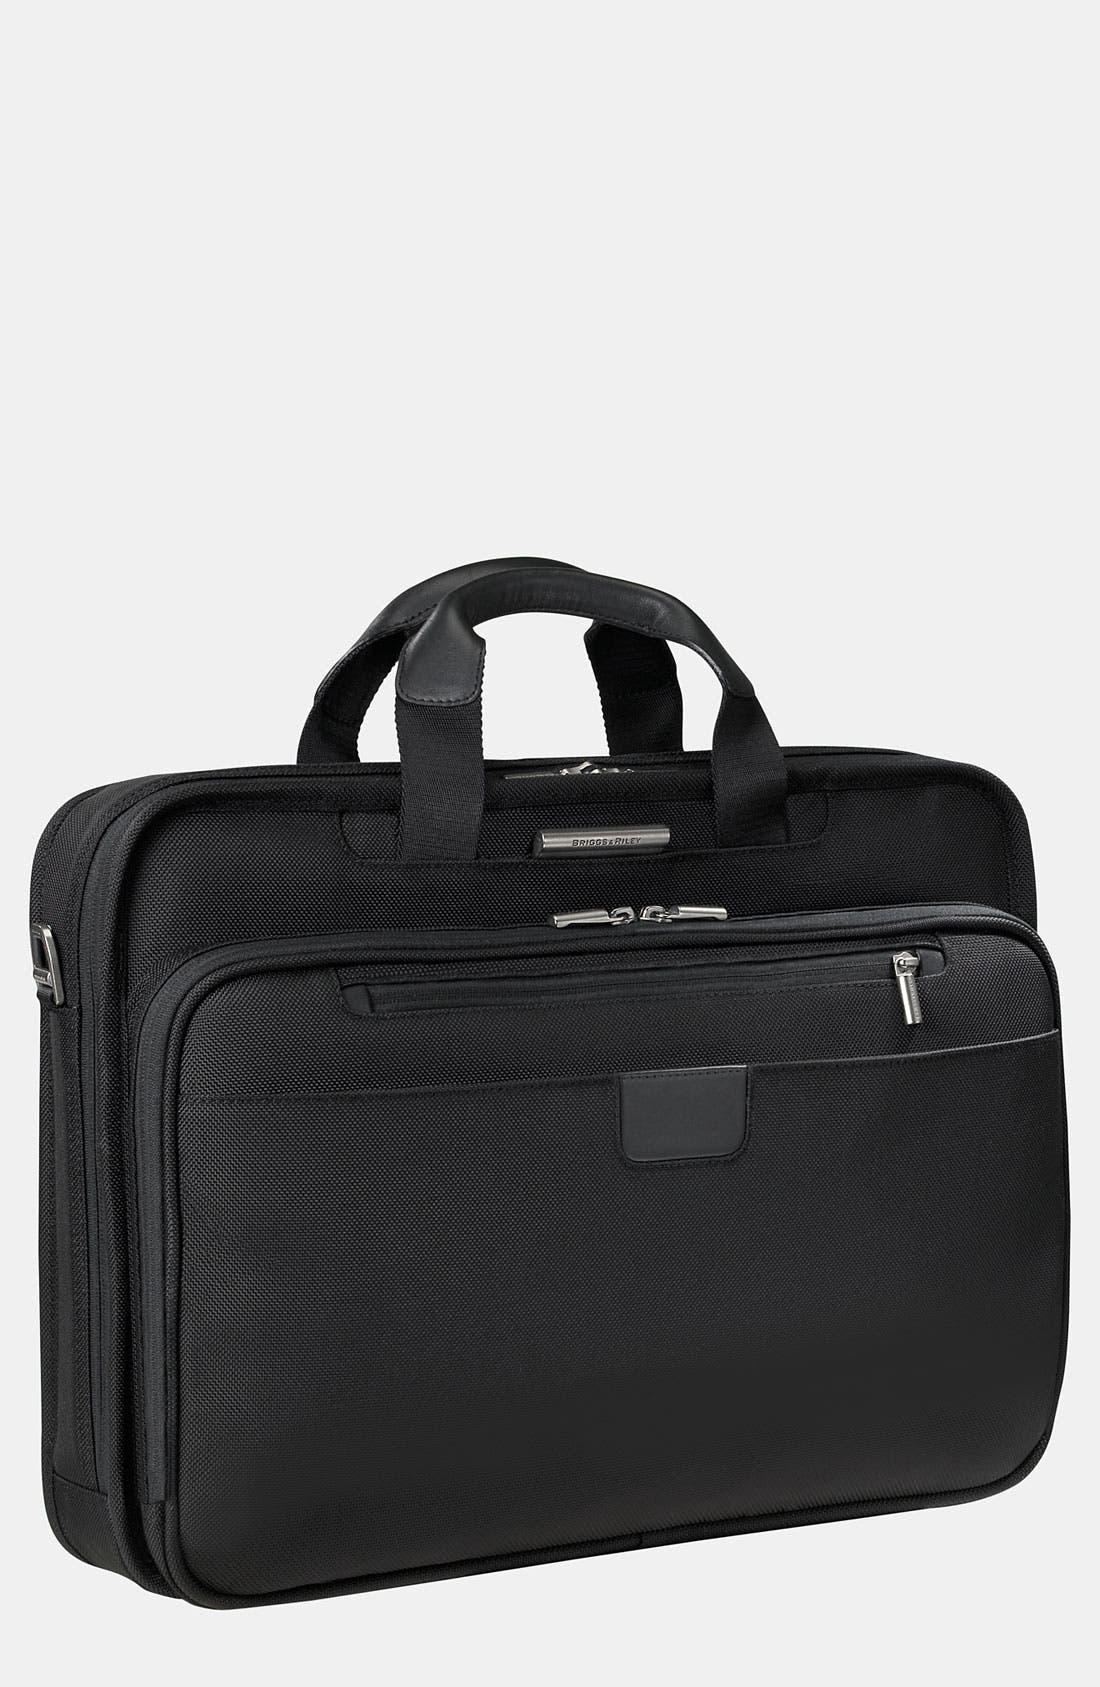 Main Image - Briggs & Riley 'Work - Large Slim' Briefcase